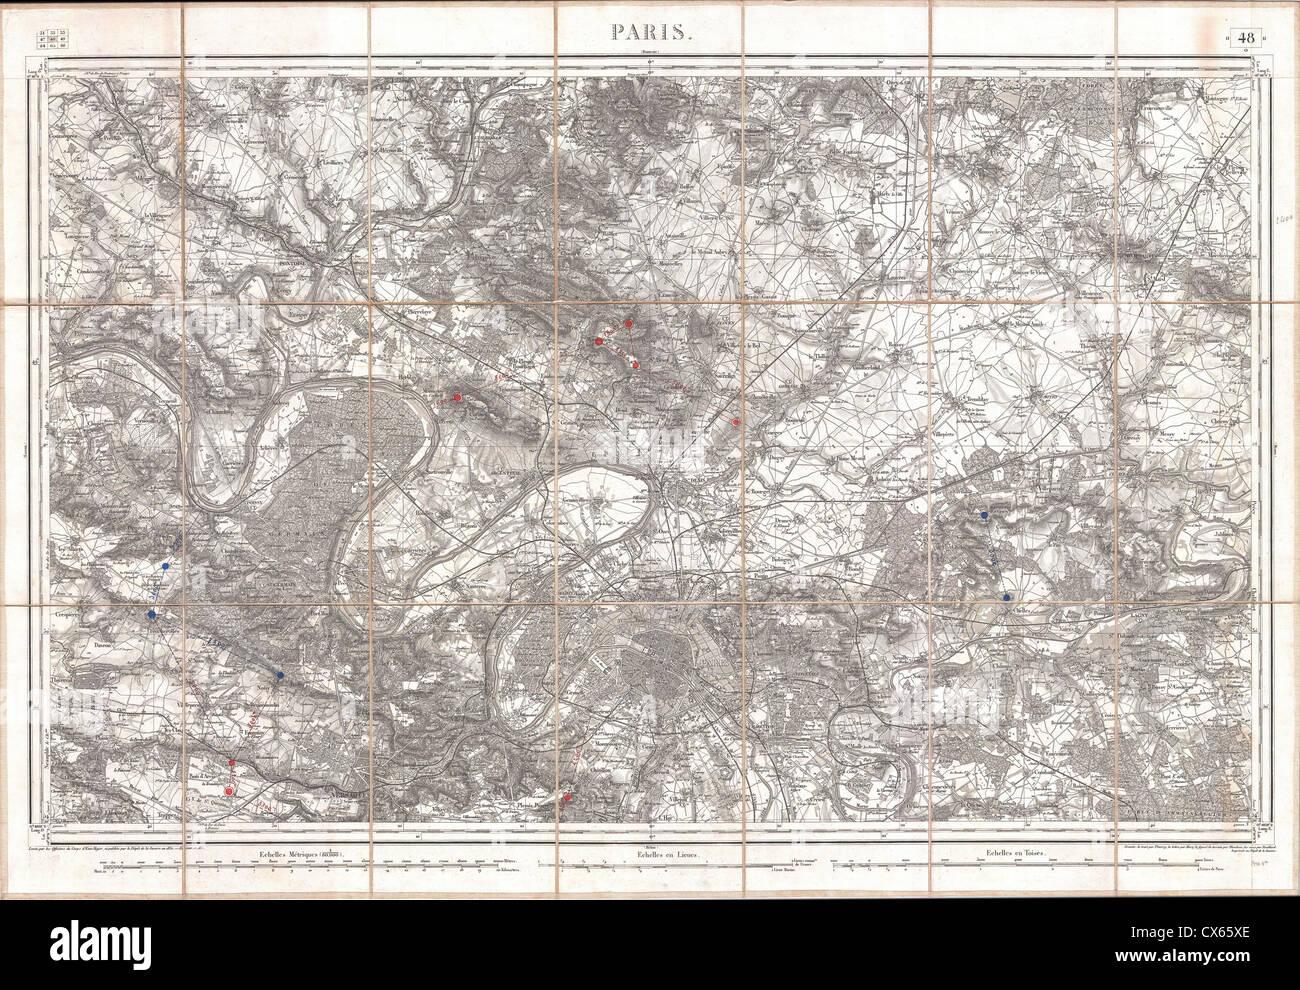 1852 Depot de Guerre Map of Paris and its Environs, France - Stock Image